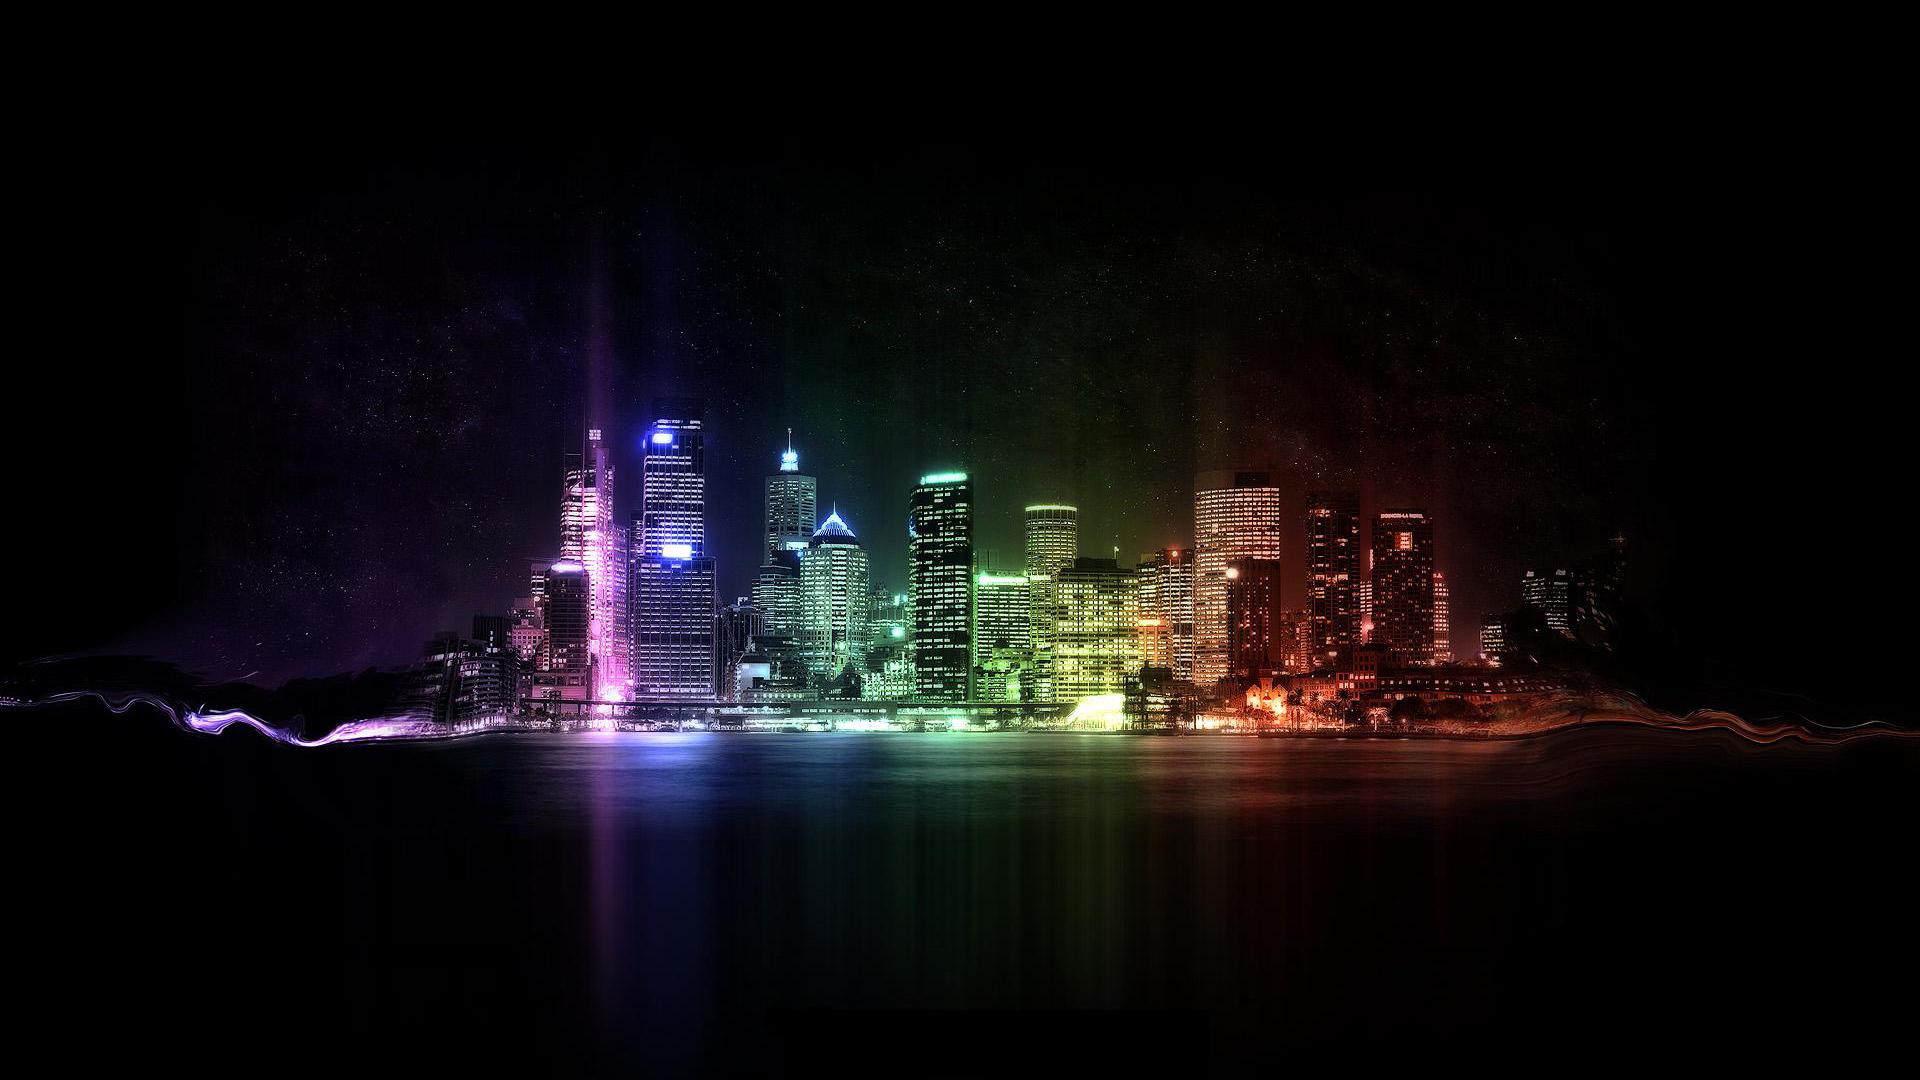 lights city wallpapers walls resolutions 1920x1080 1920x1080